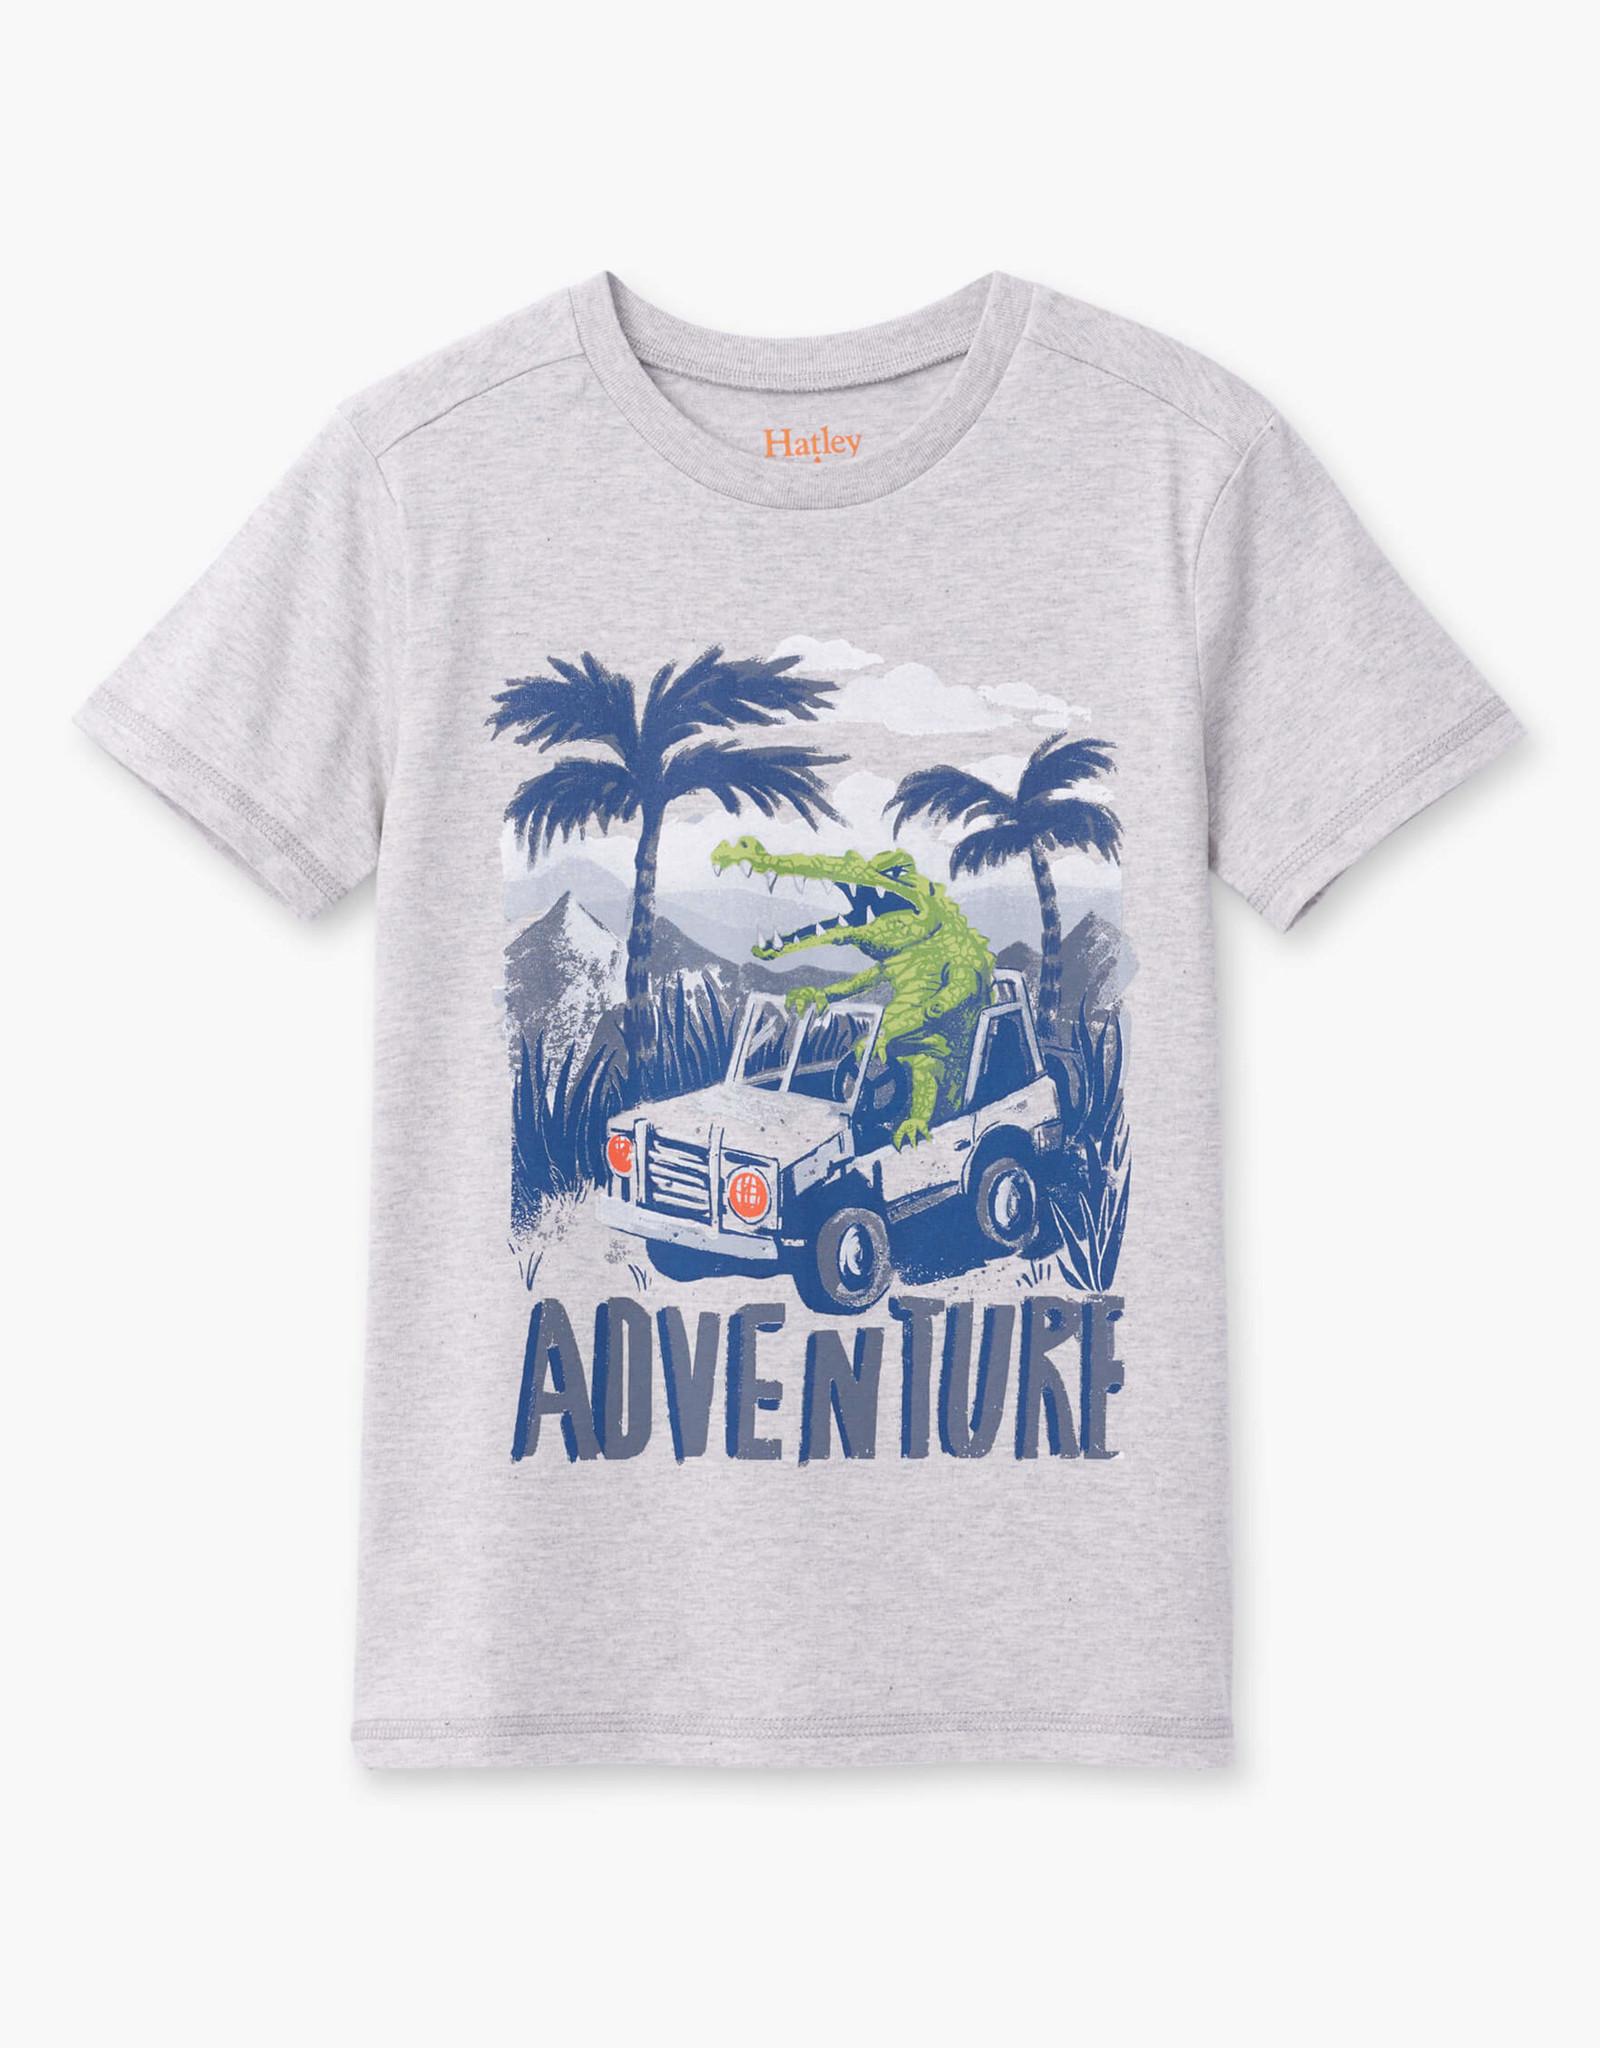 hatley Jungle Adventure Graphic Tee